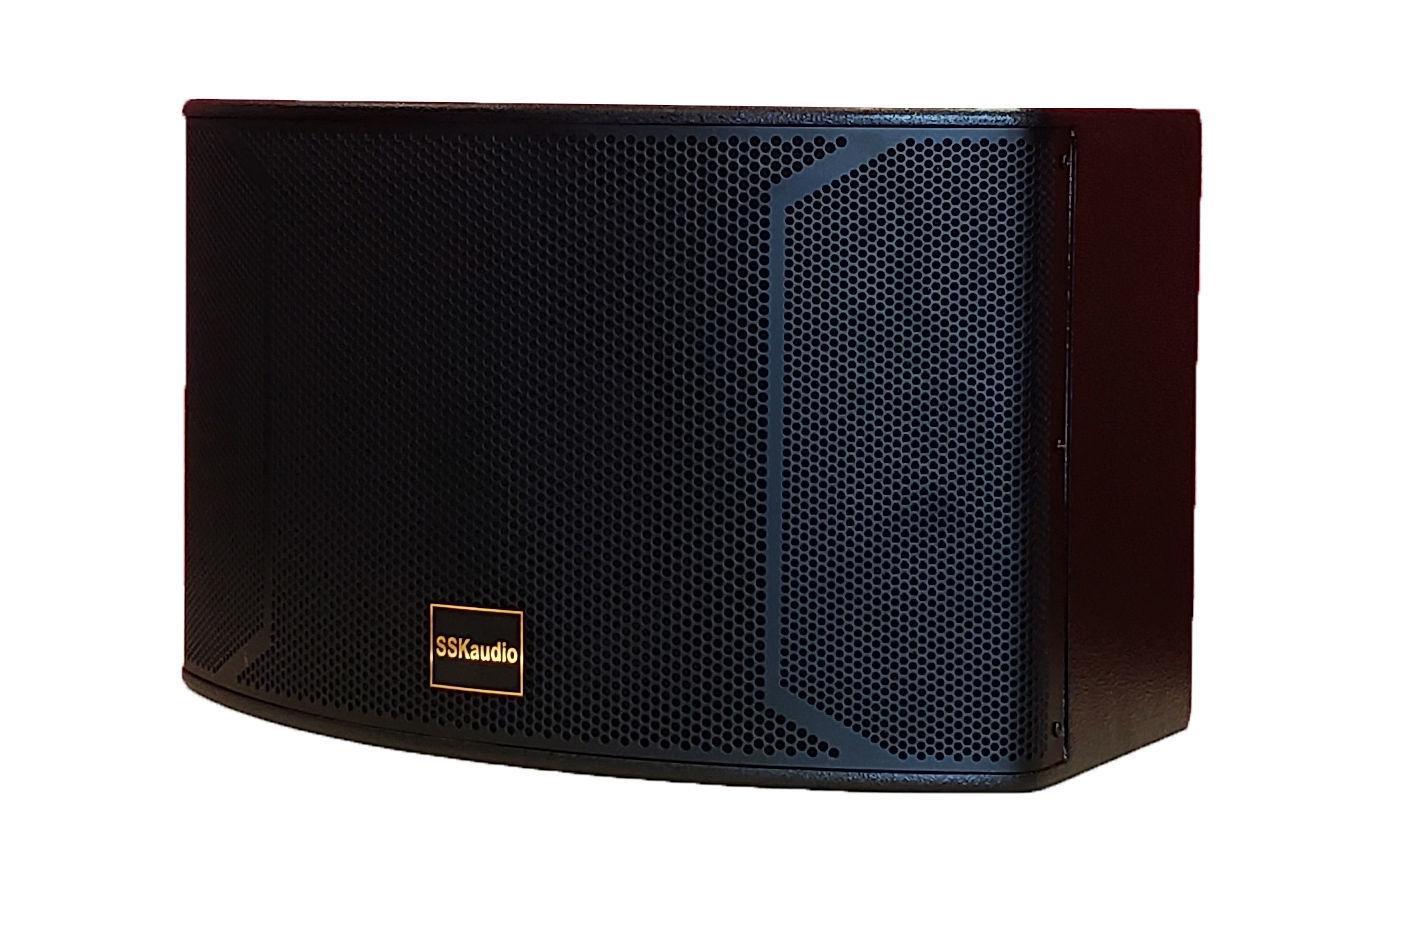 Hình ảnh SSKaudio K-12 2000 Watt 3 Way Karaoke Speaker